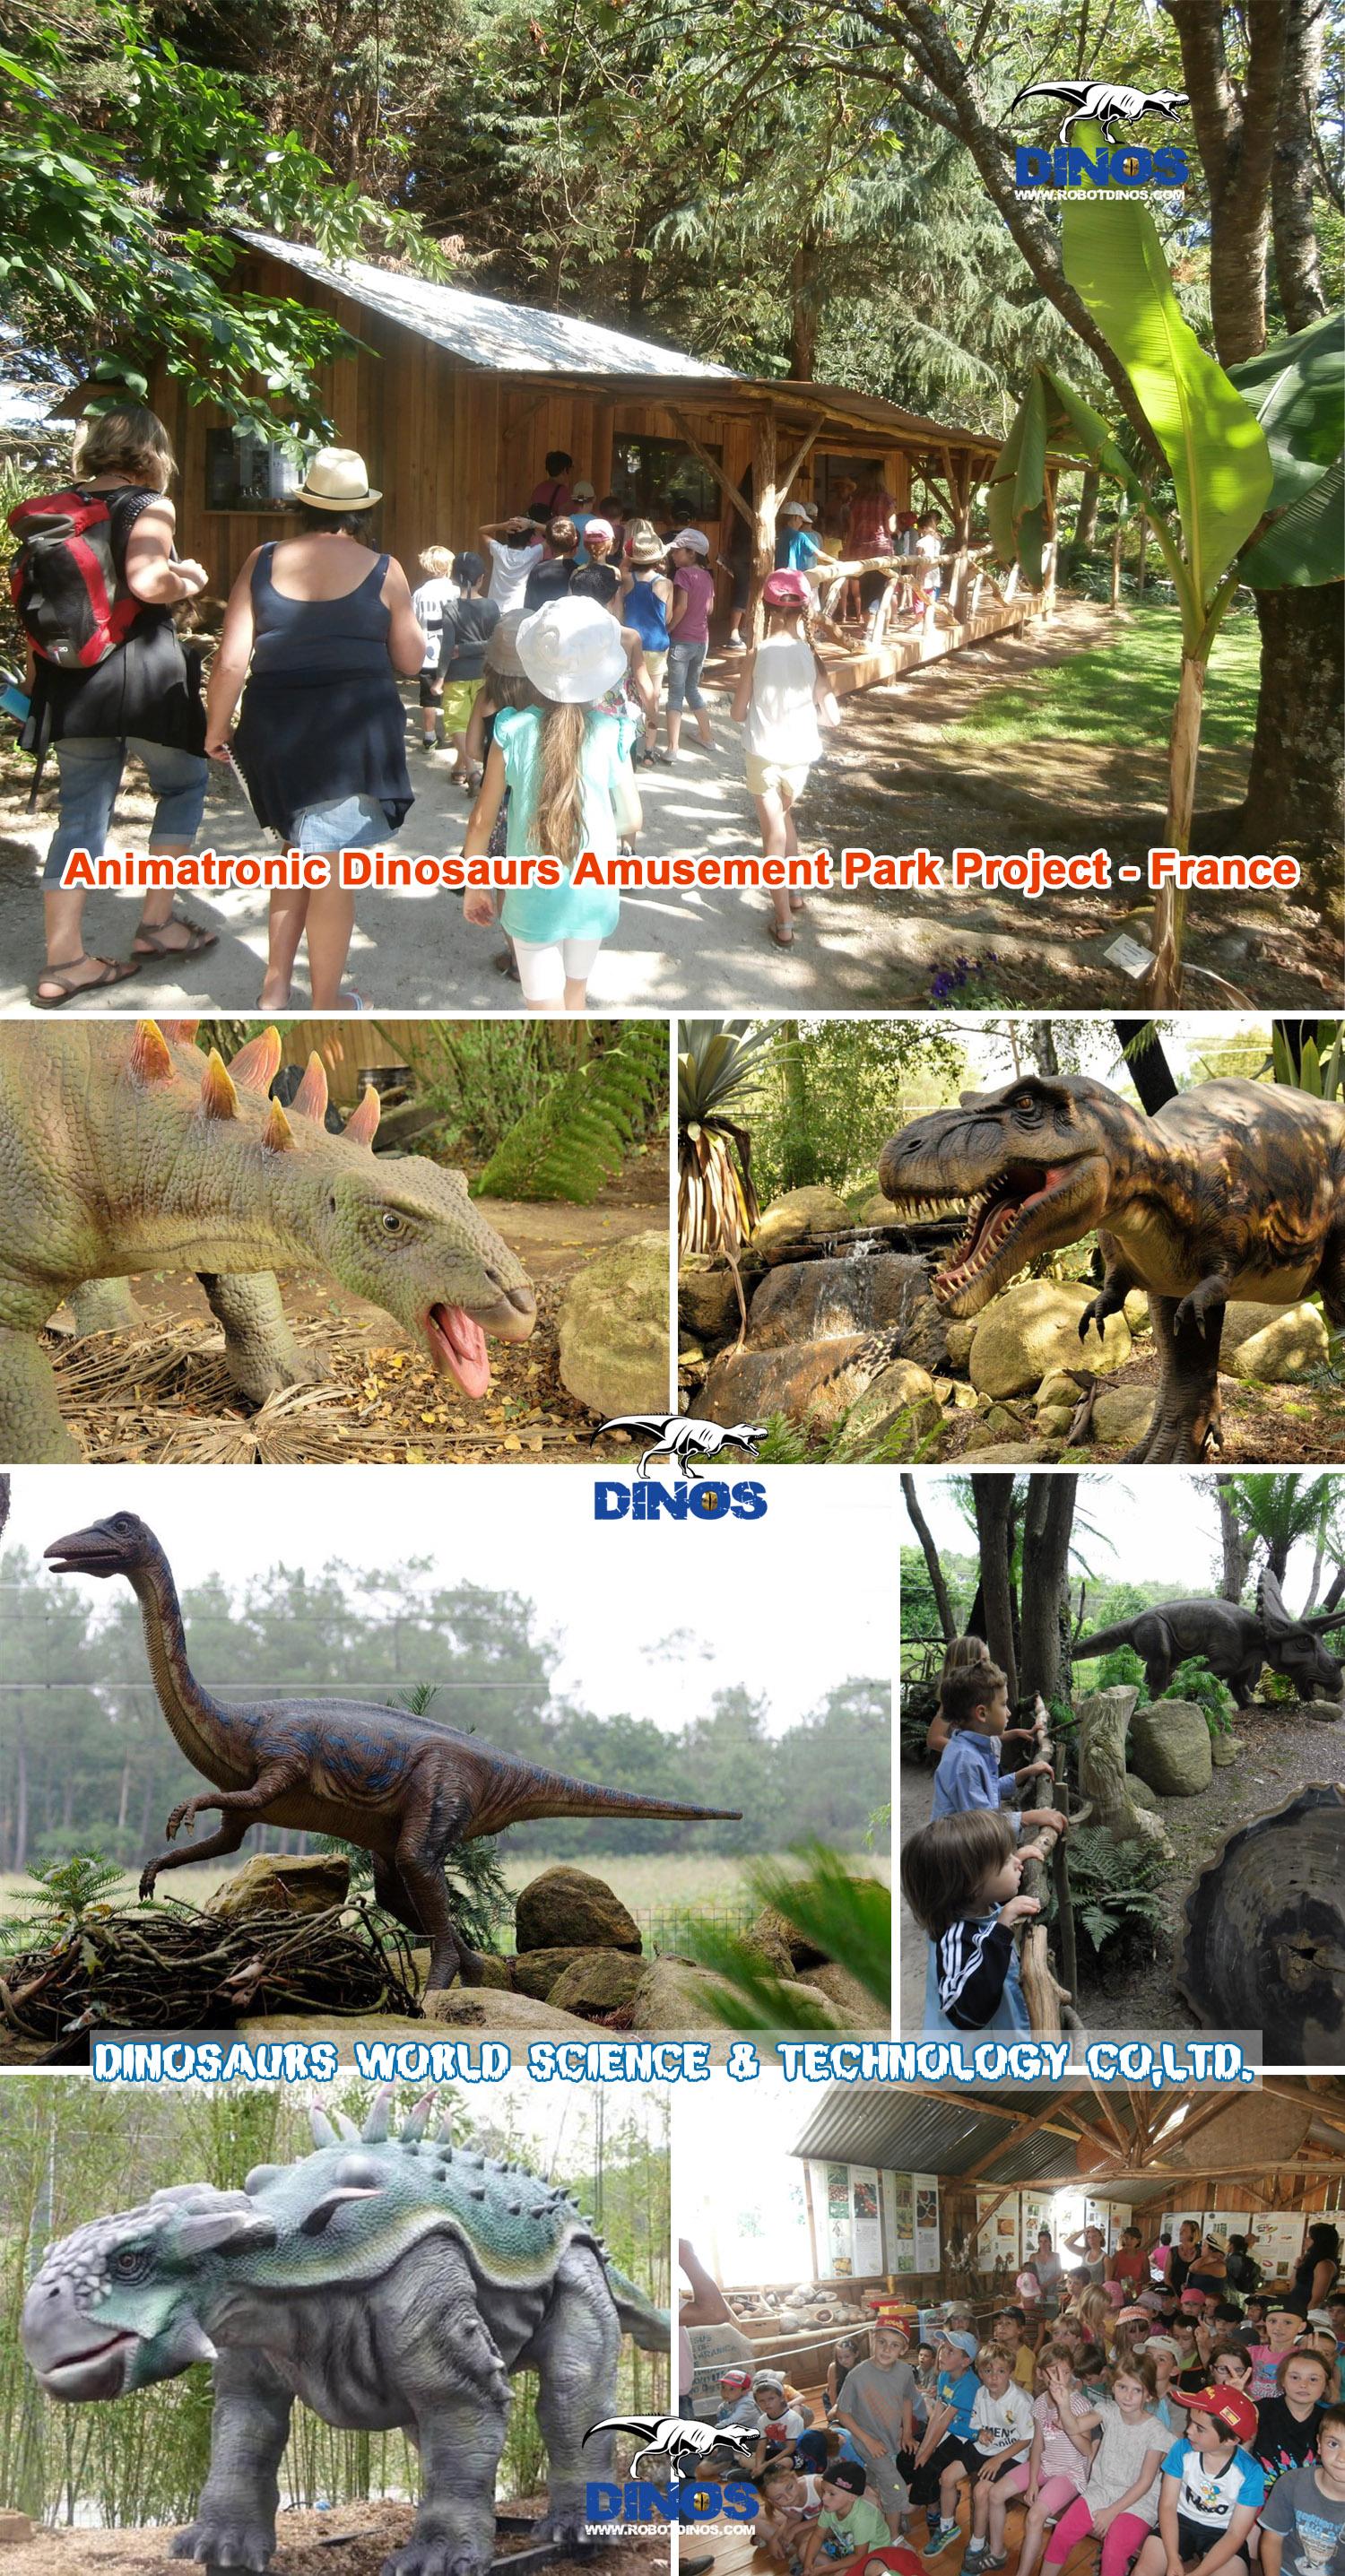 animatronic dinosaurs,dinosaur costumes,amusement park dinosaurs,amusement park attraction,amusement park decoration,robotic dinosaurs,dinosaur robotic